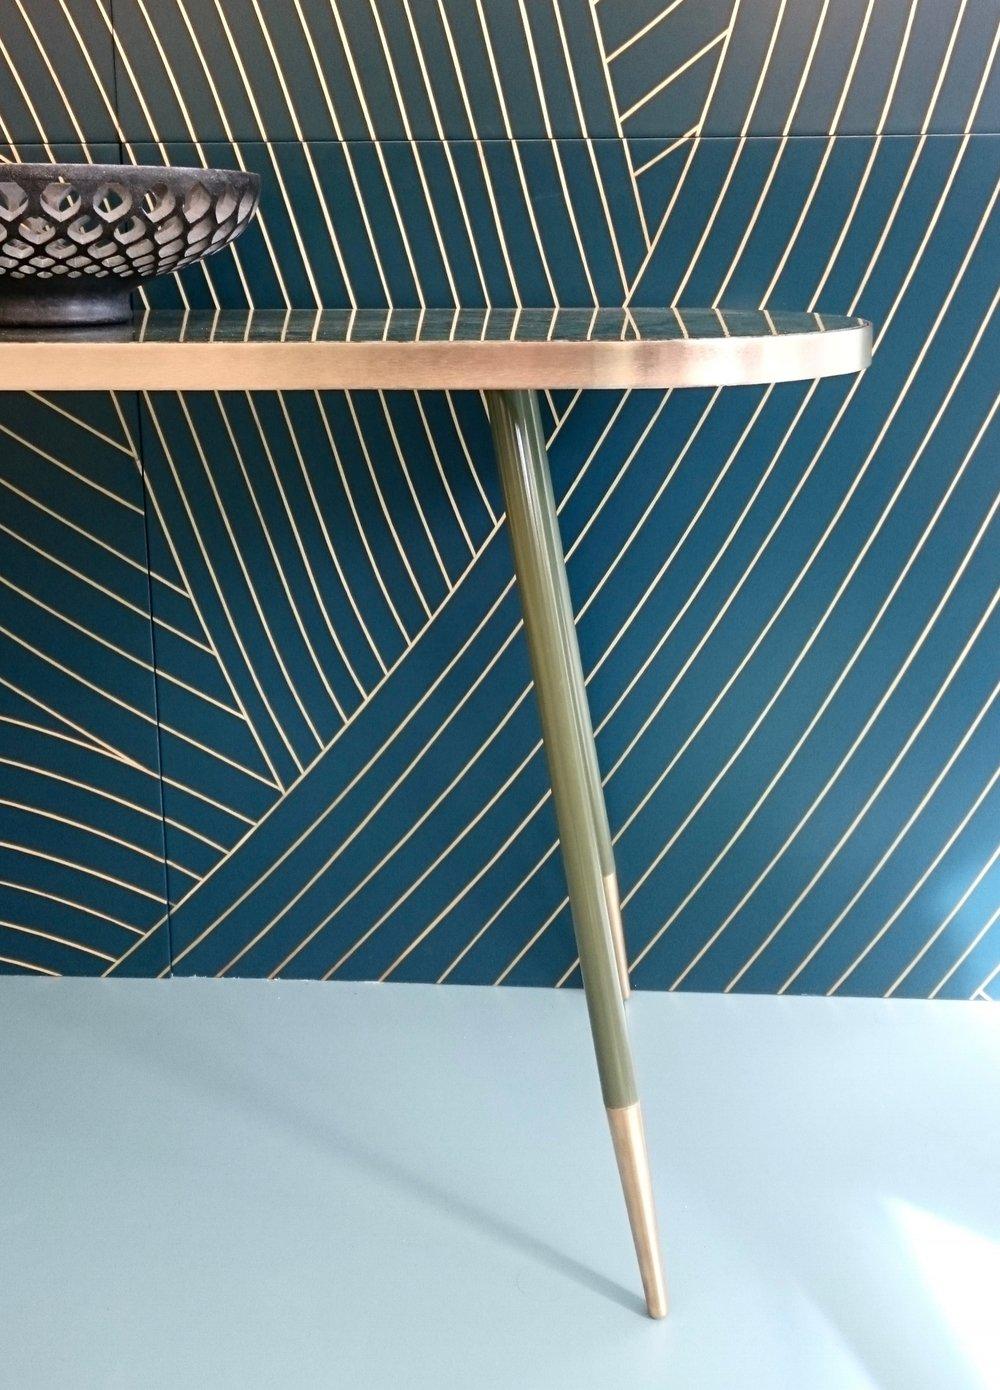 Bethan Gray Table at London Design Festival 2016 –Smarstyle Interiors.jpg